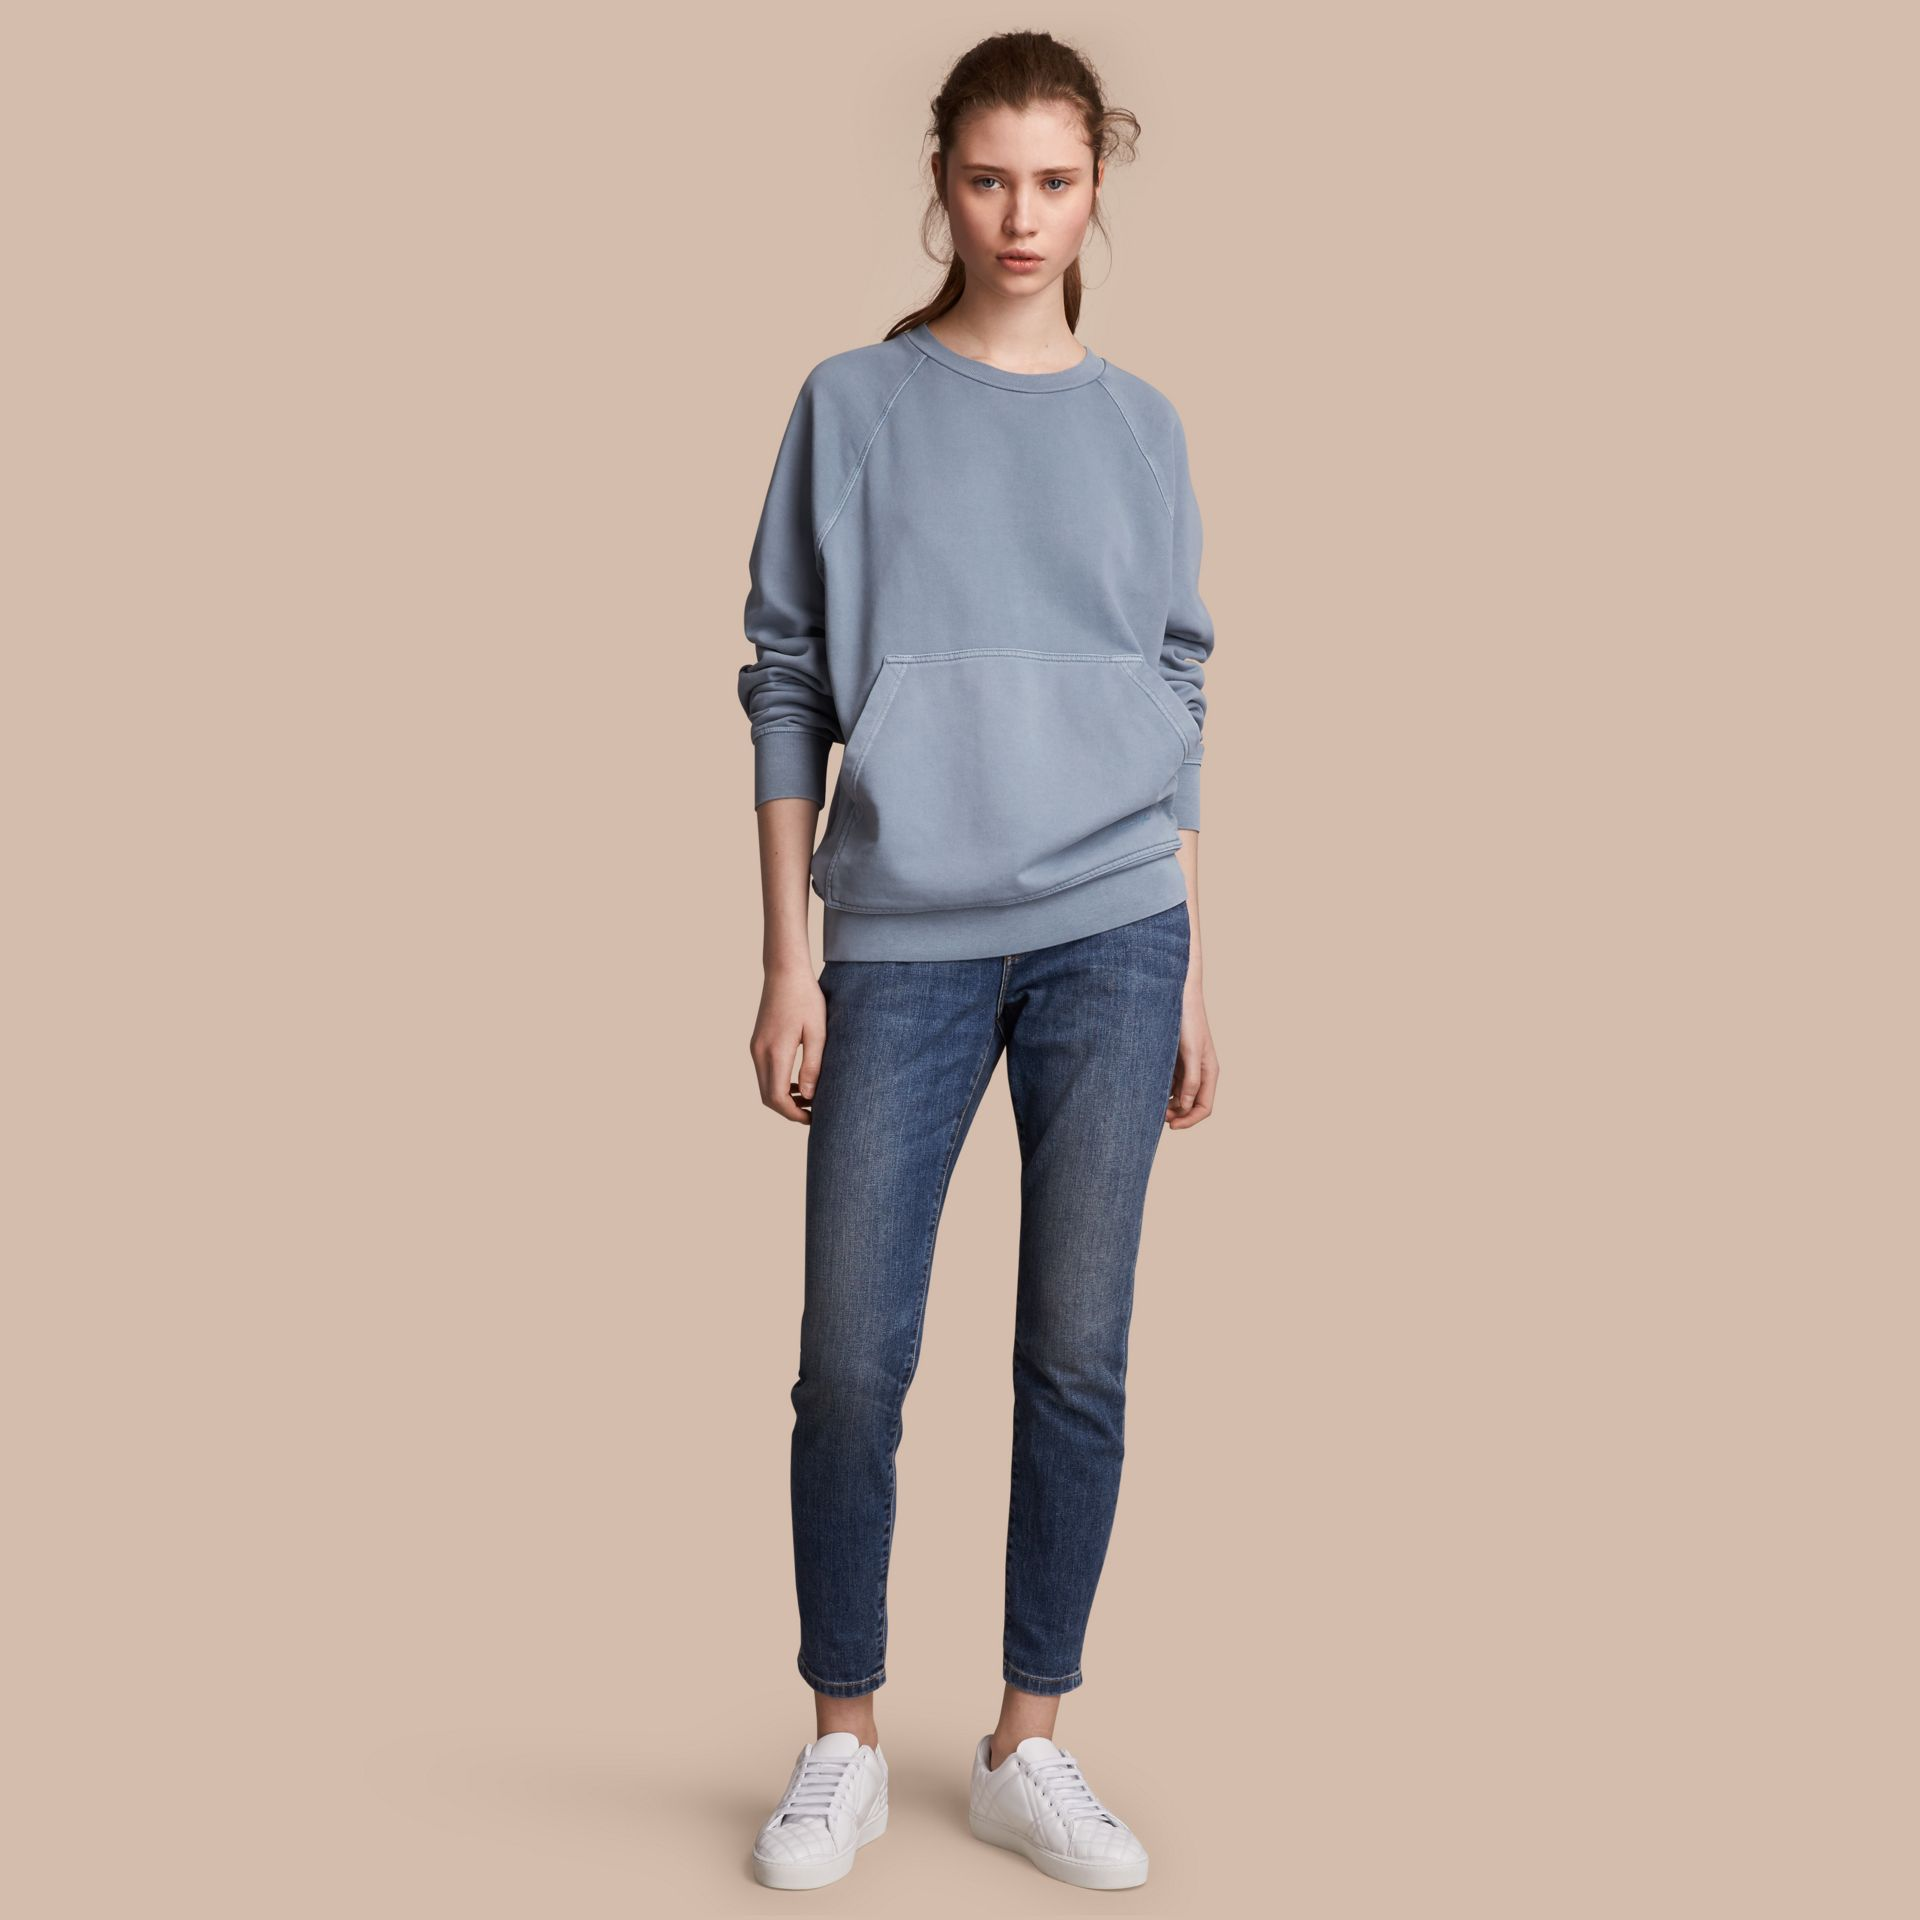 Unisex Pigment-dyed Cotton Oversize Sweatshirt in Dusty Blue - Women | Burberry Australia - gallery image 1